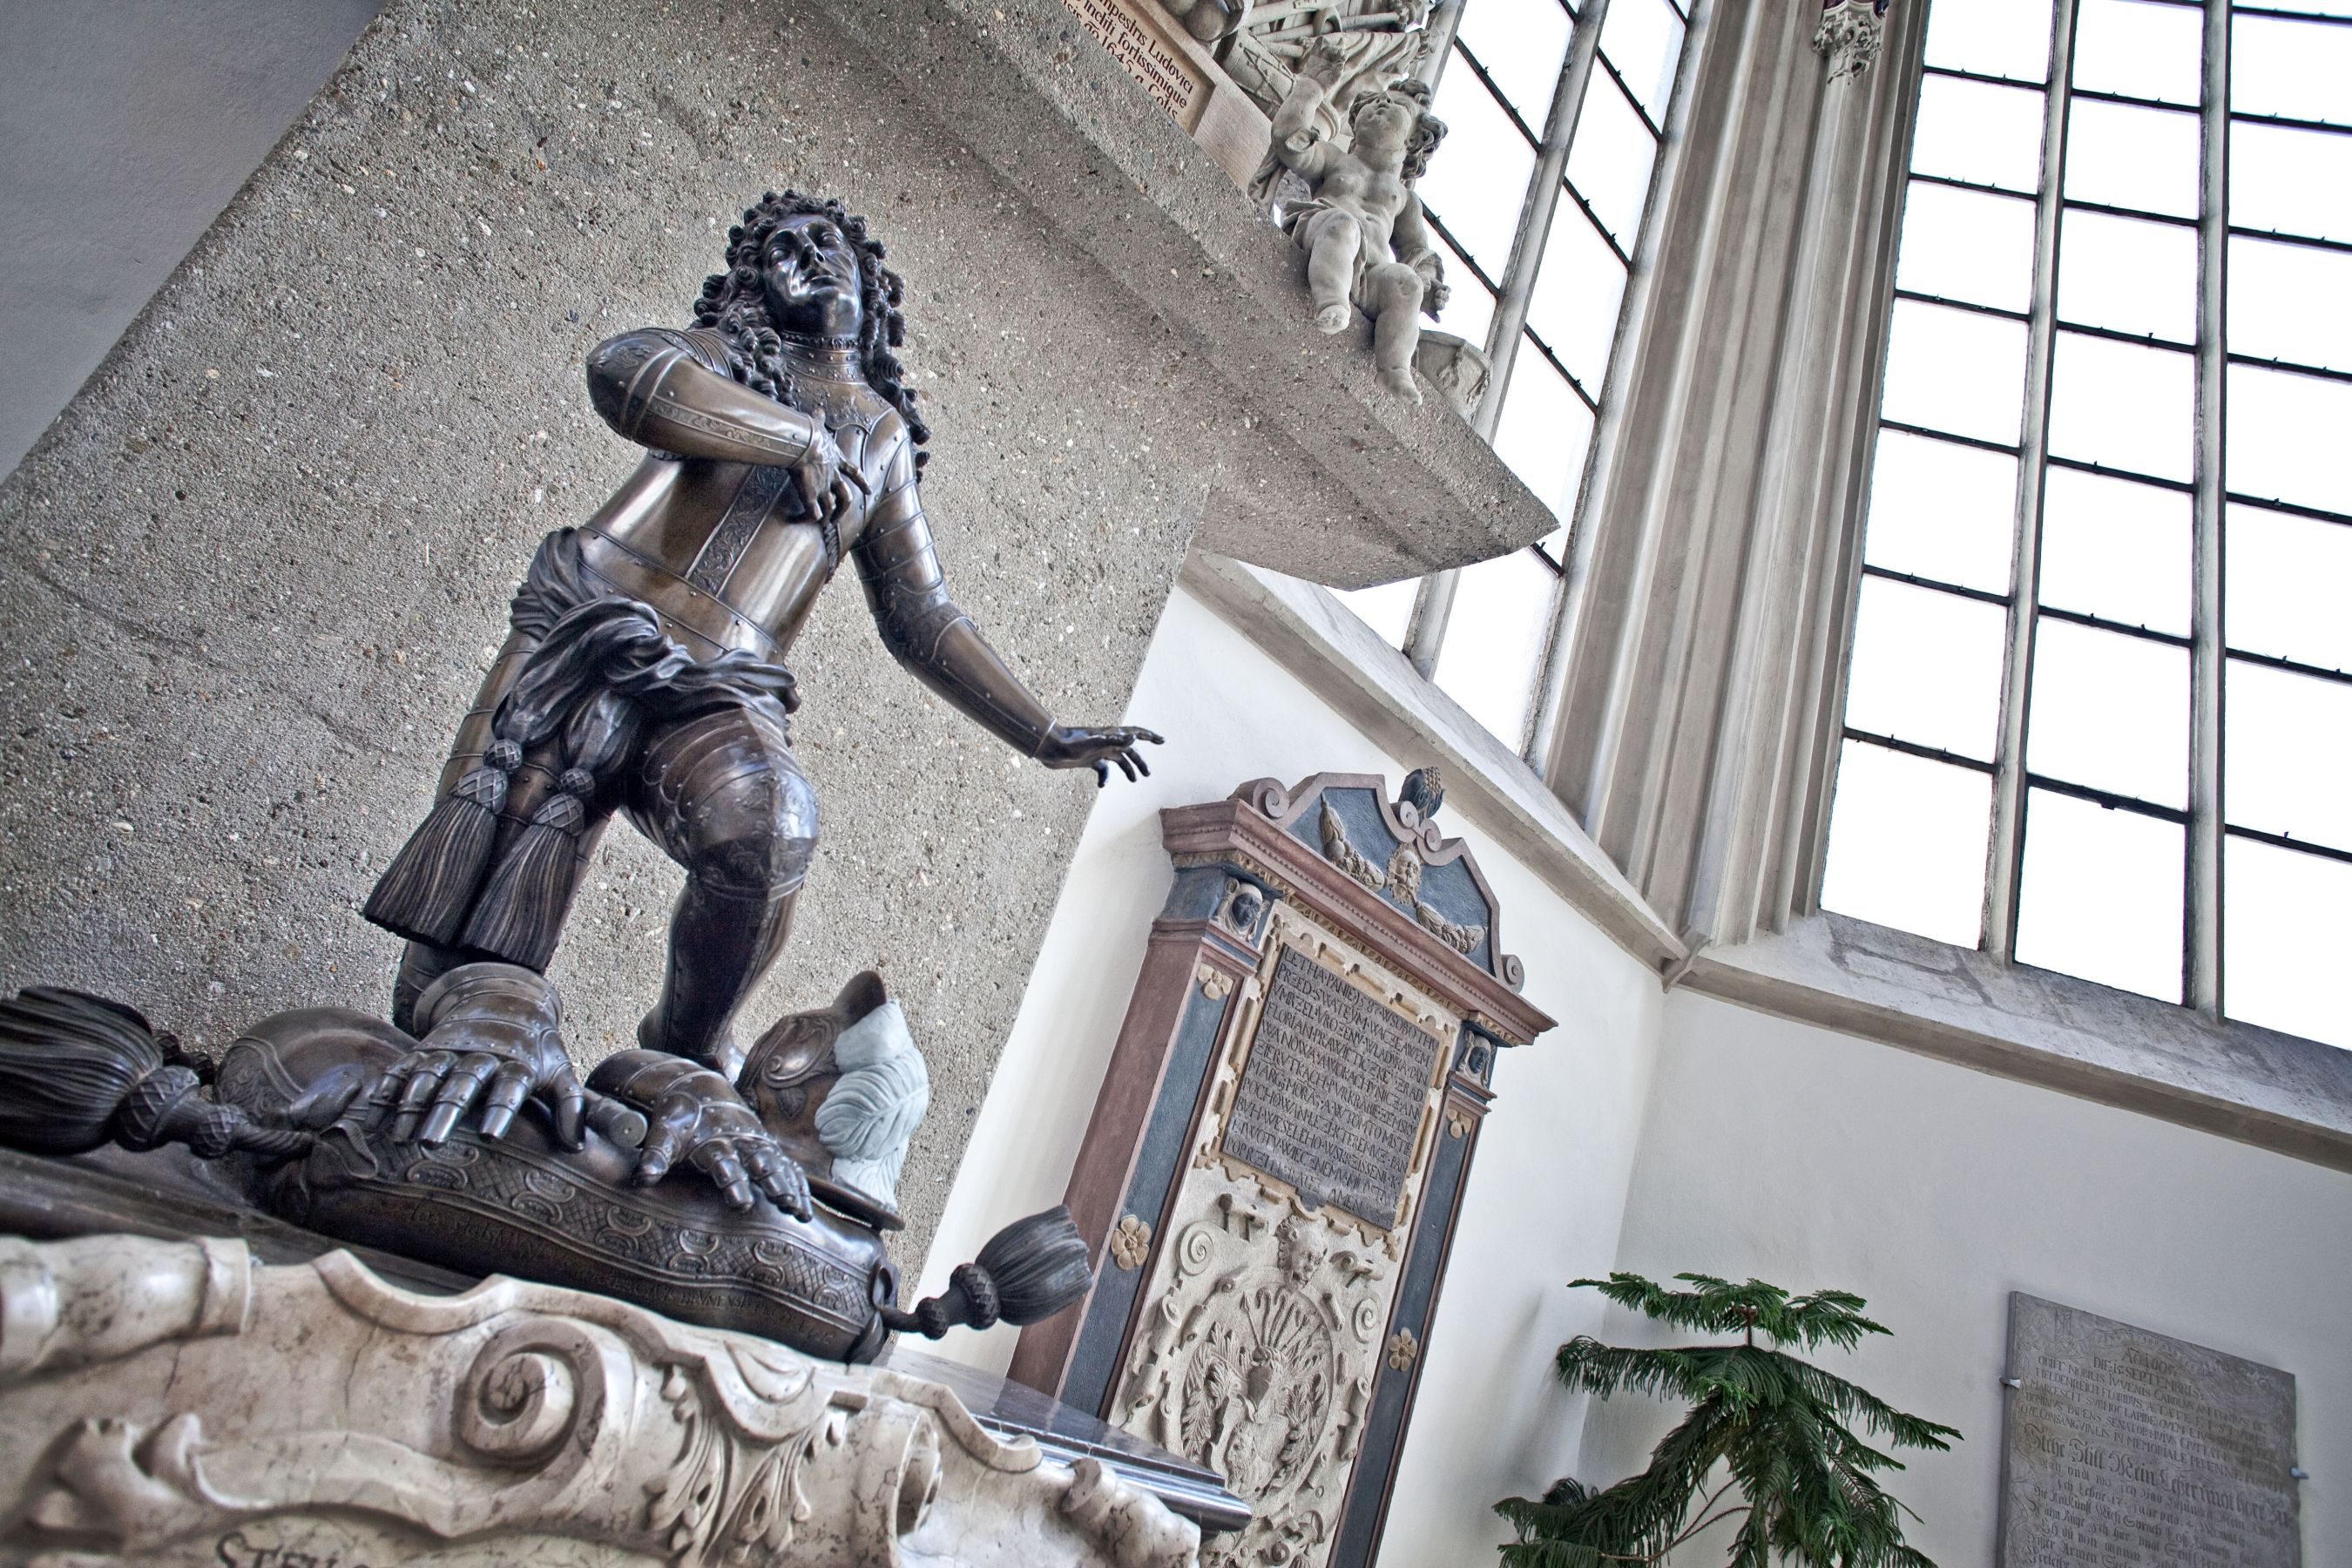 ST. JAMES' CHURCH in Brně